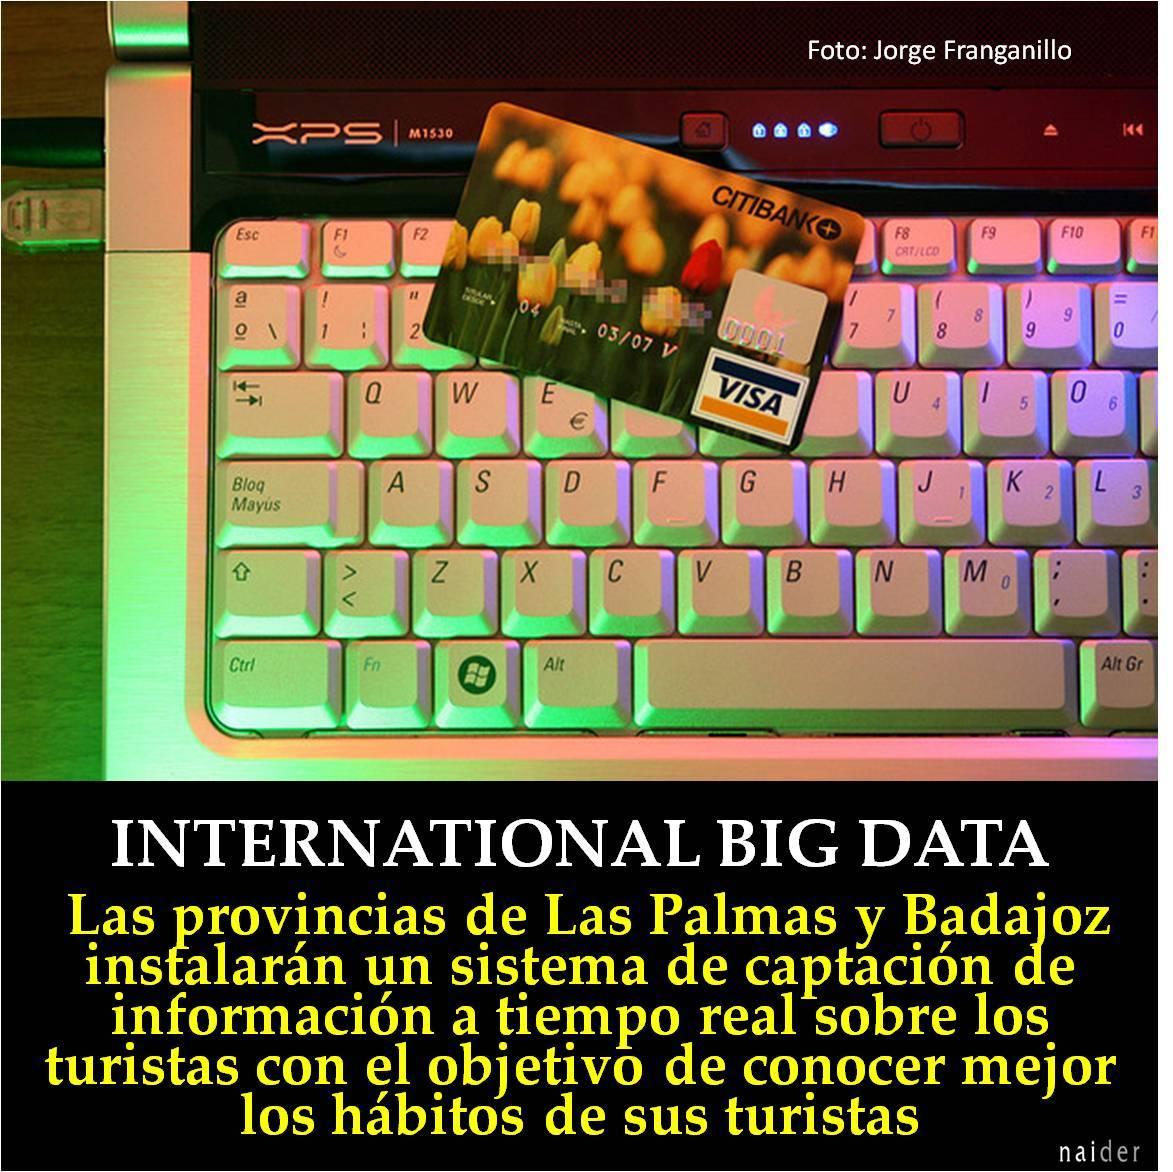 International Big Data